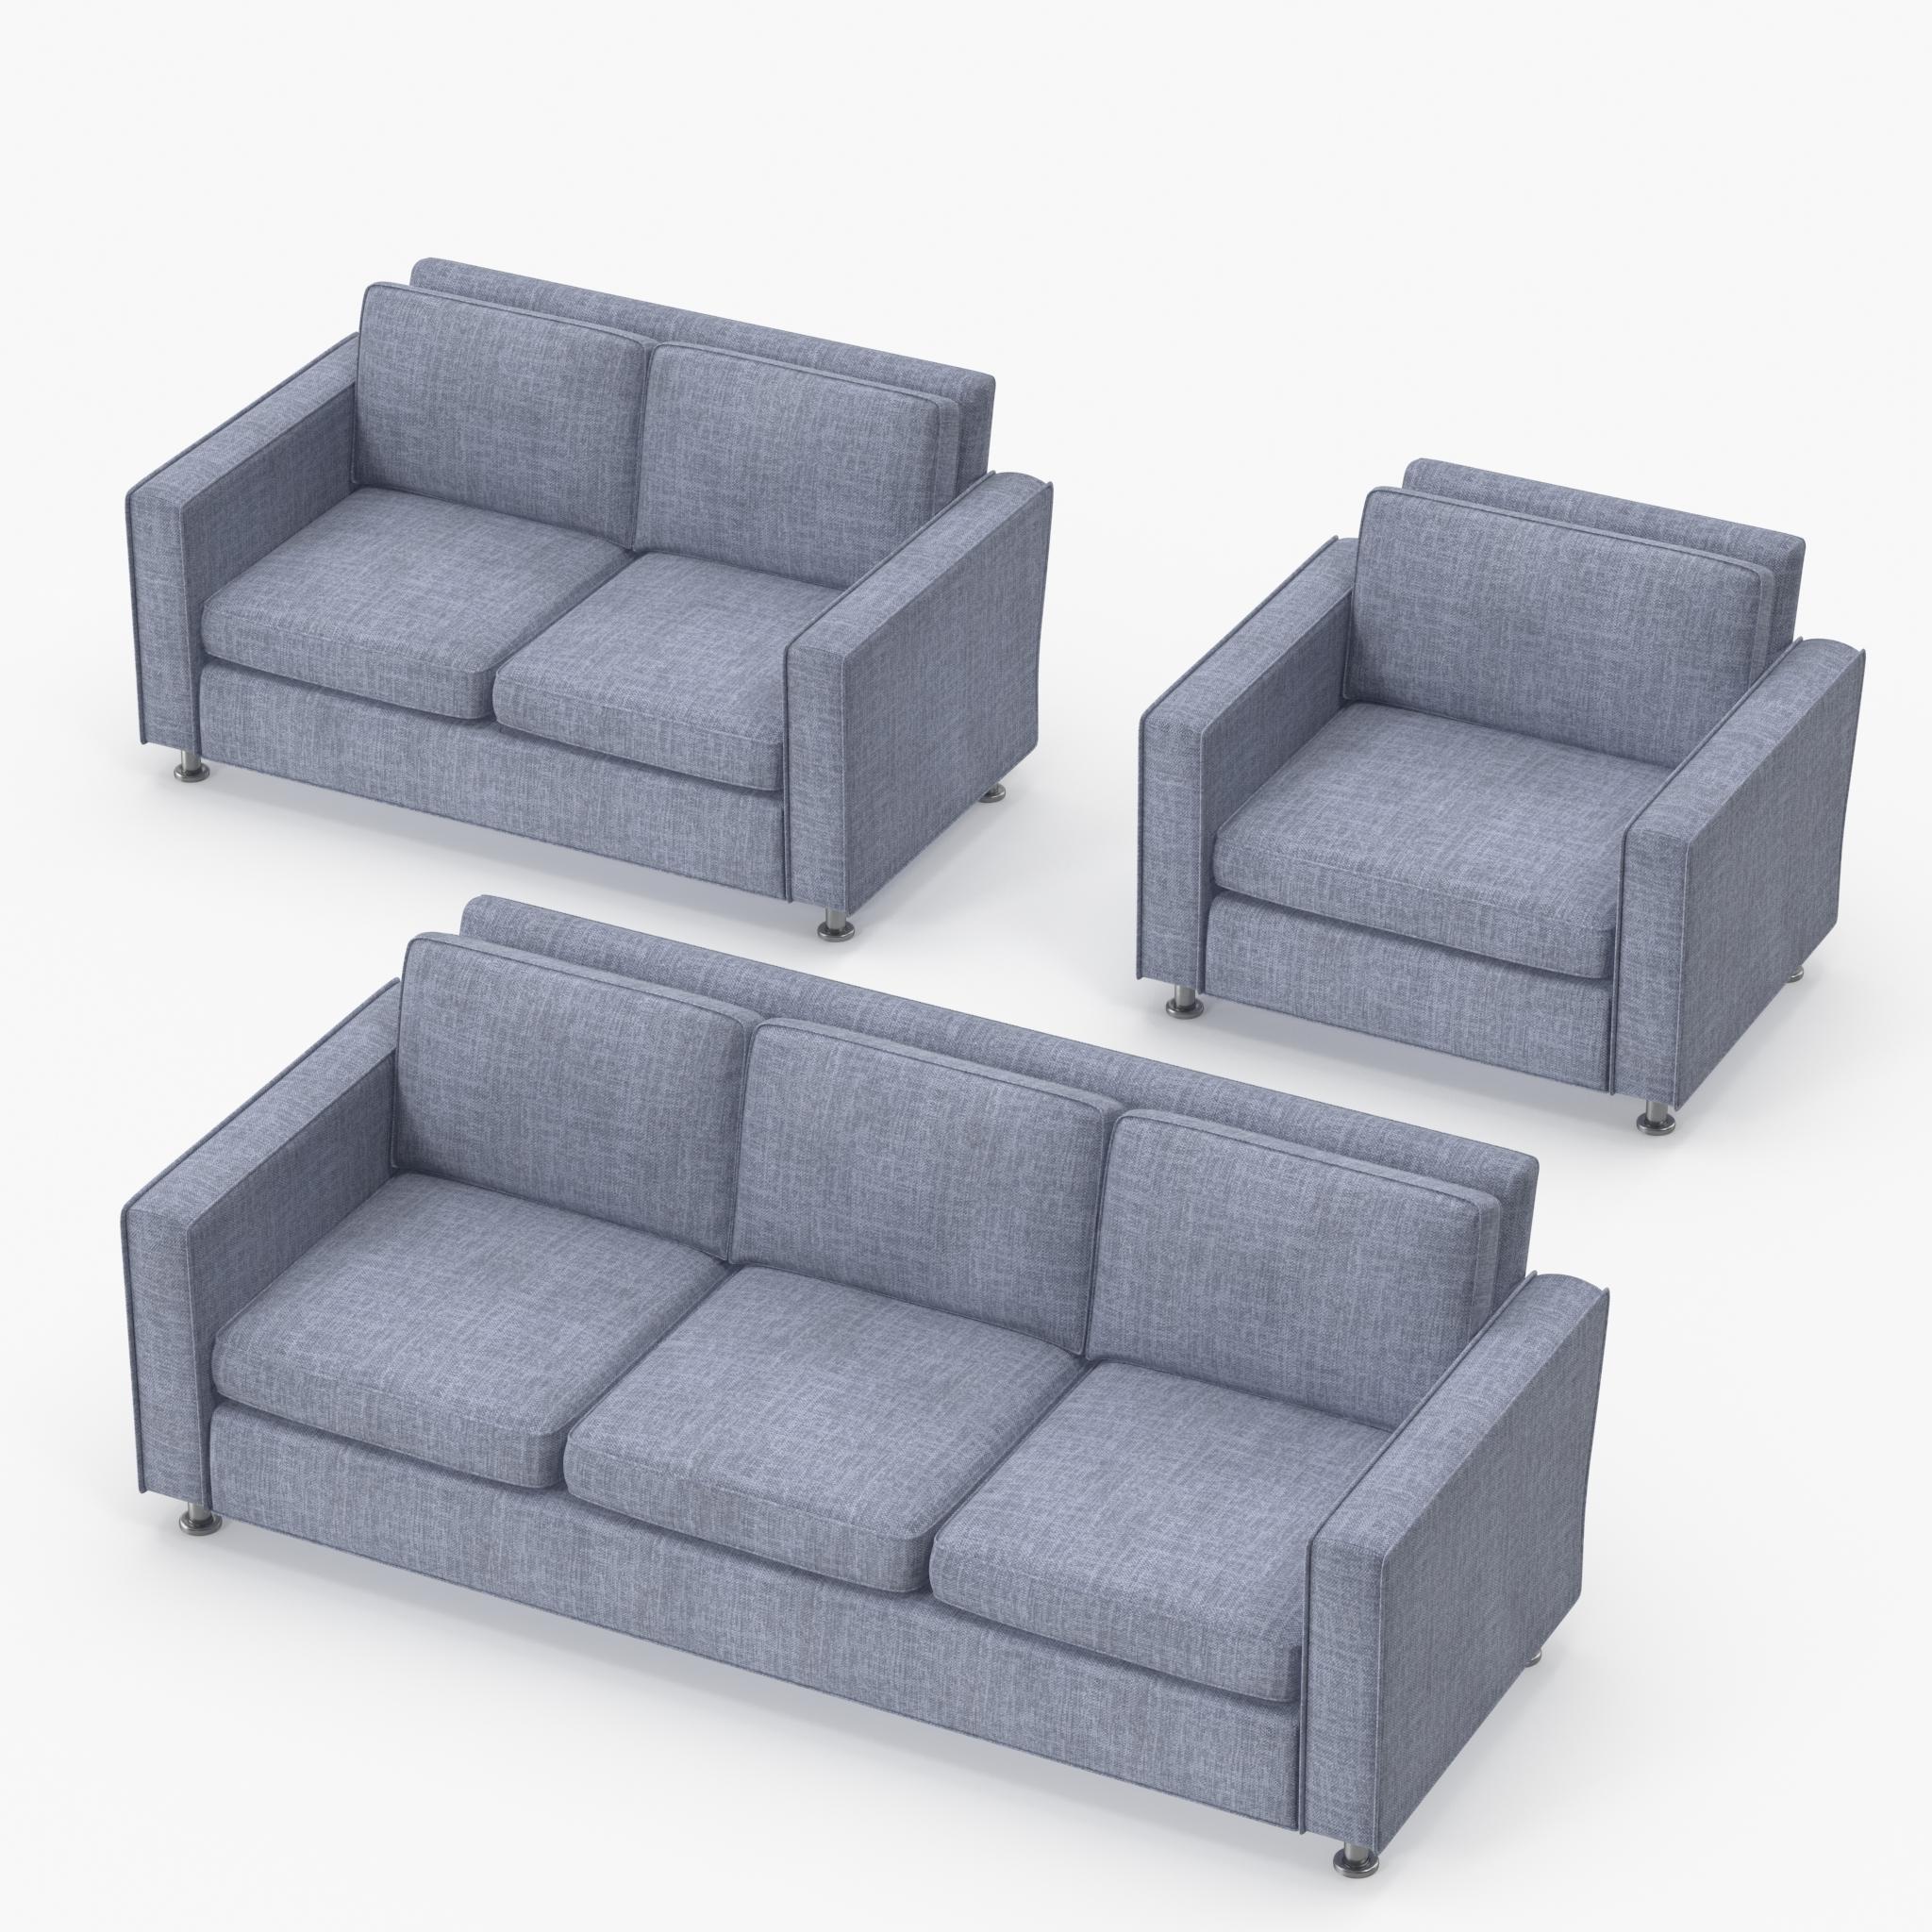 Clic Sofa Set Seat Model